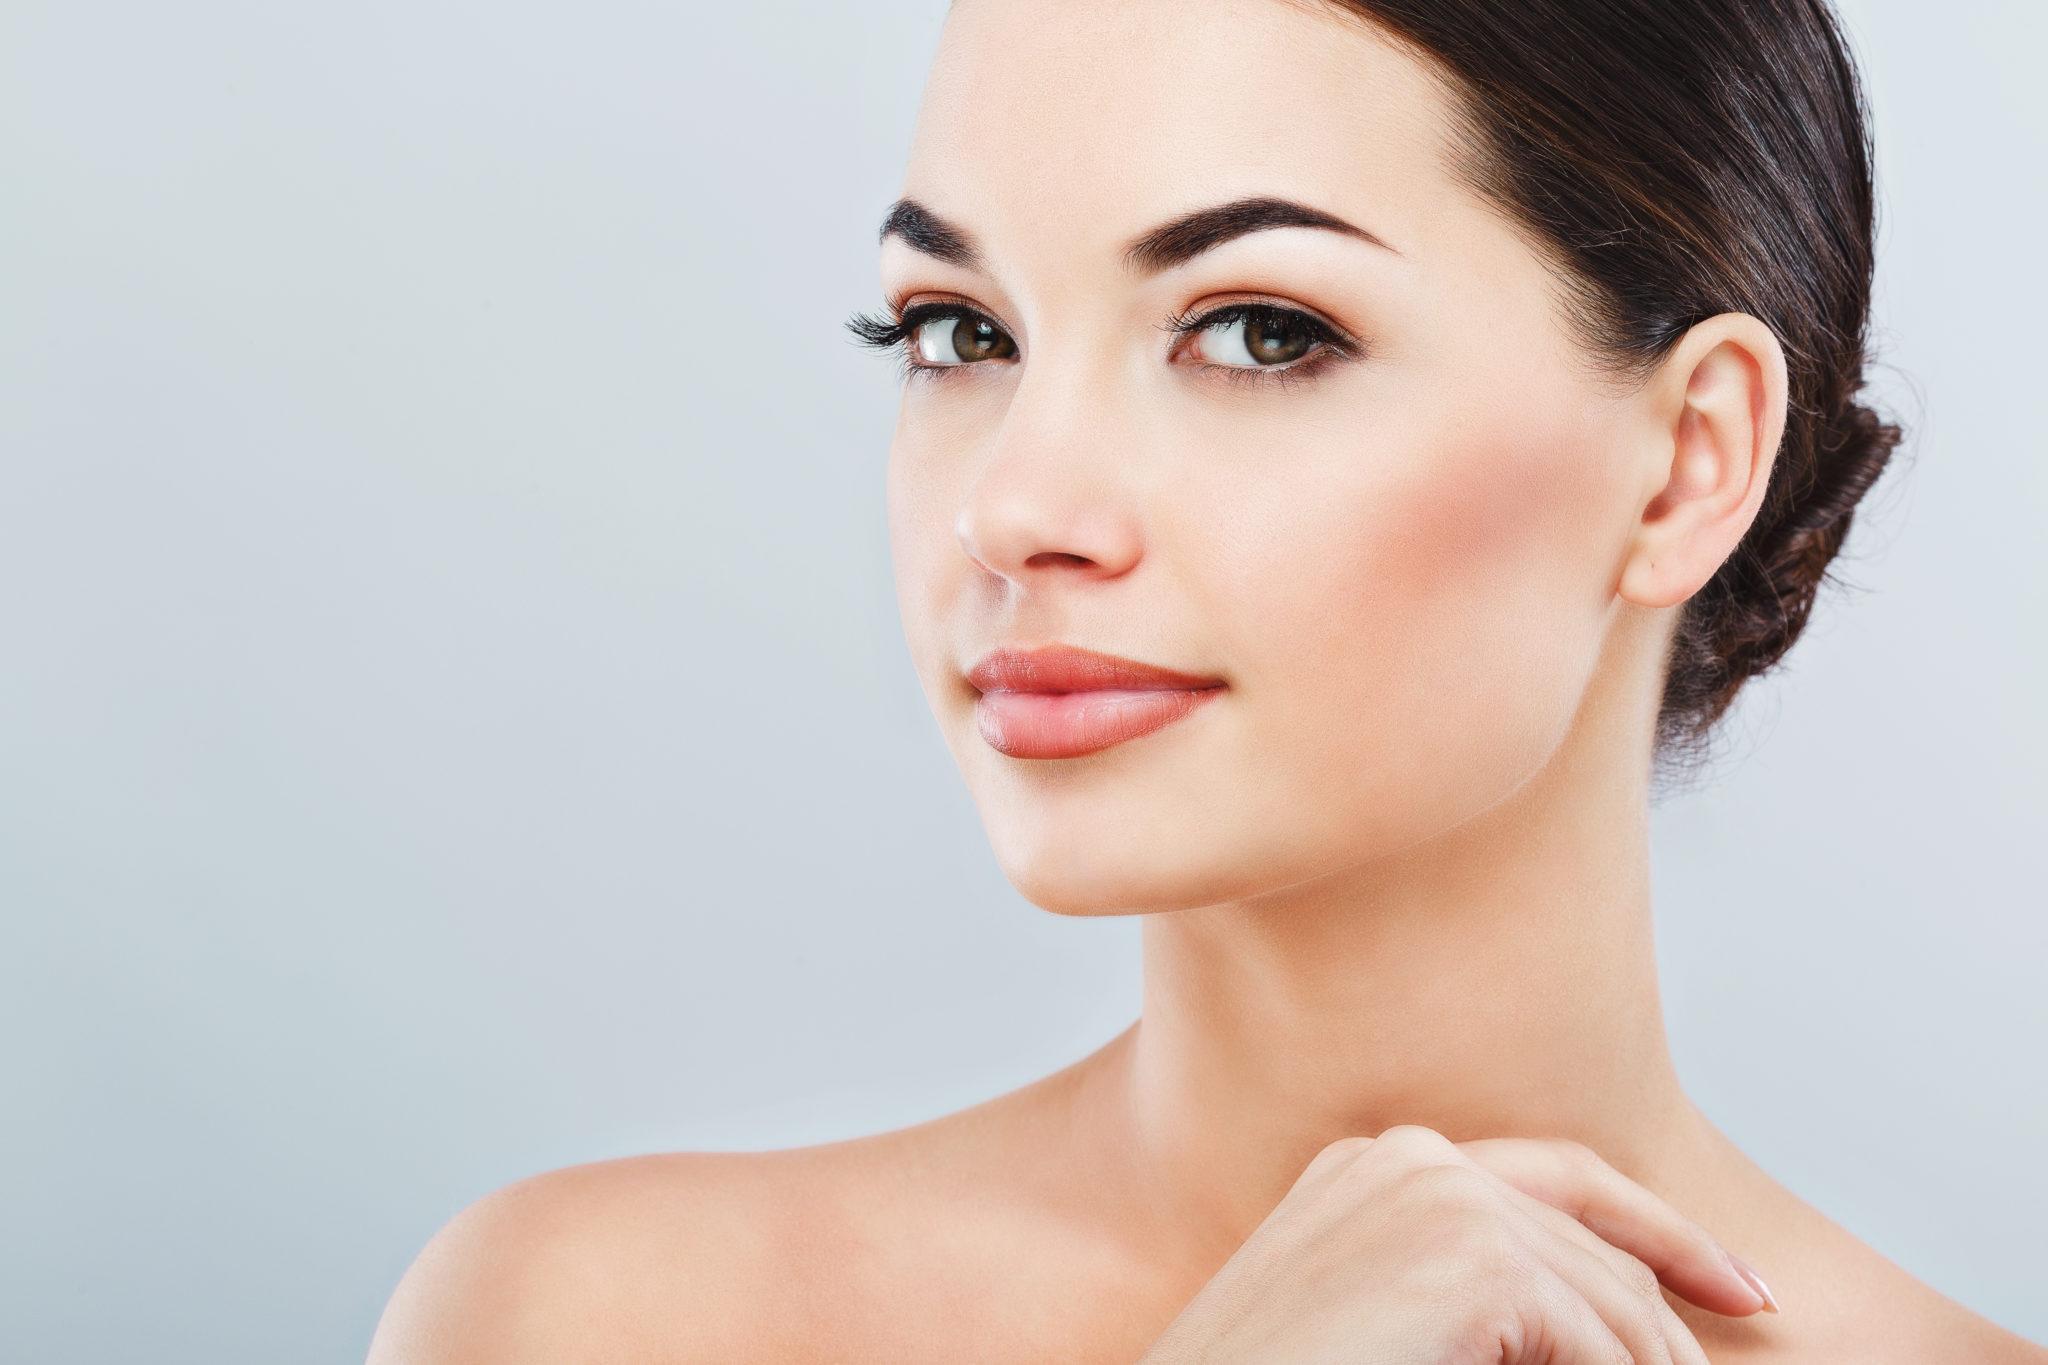 PunjabKesari, Aibros Comb Look Image, Beauty Trends Image